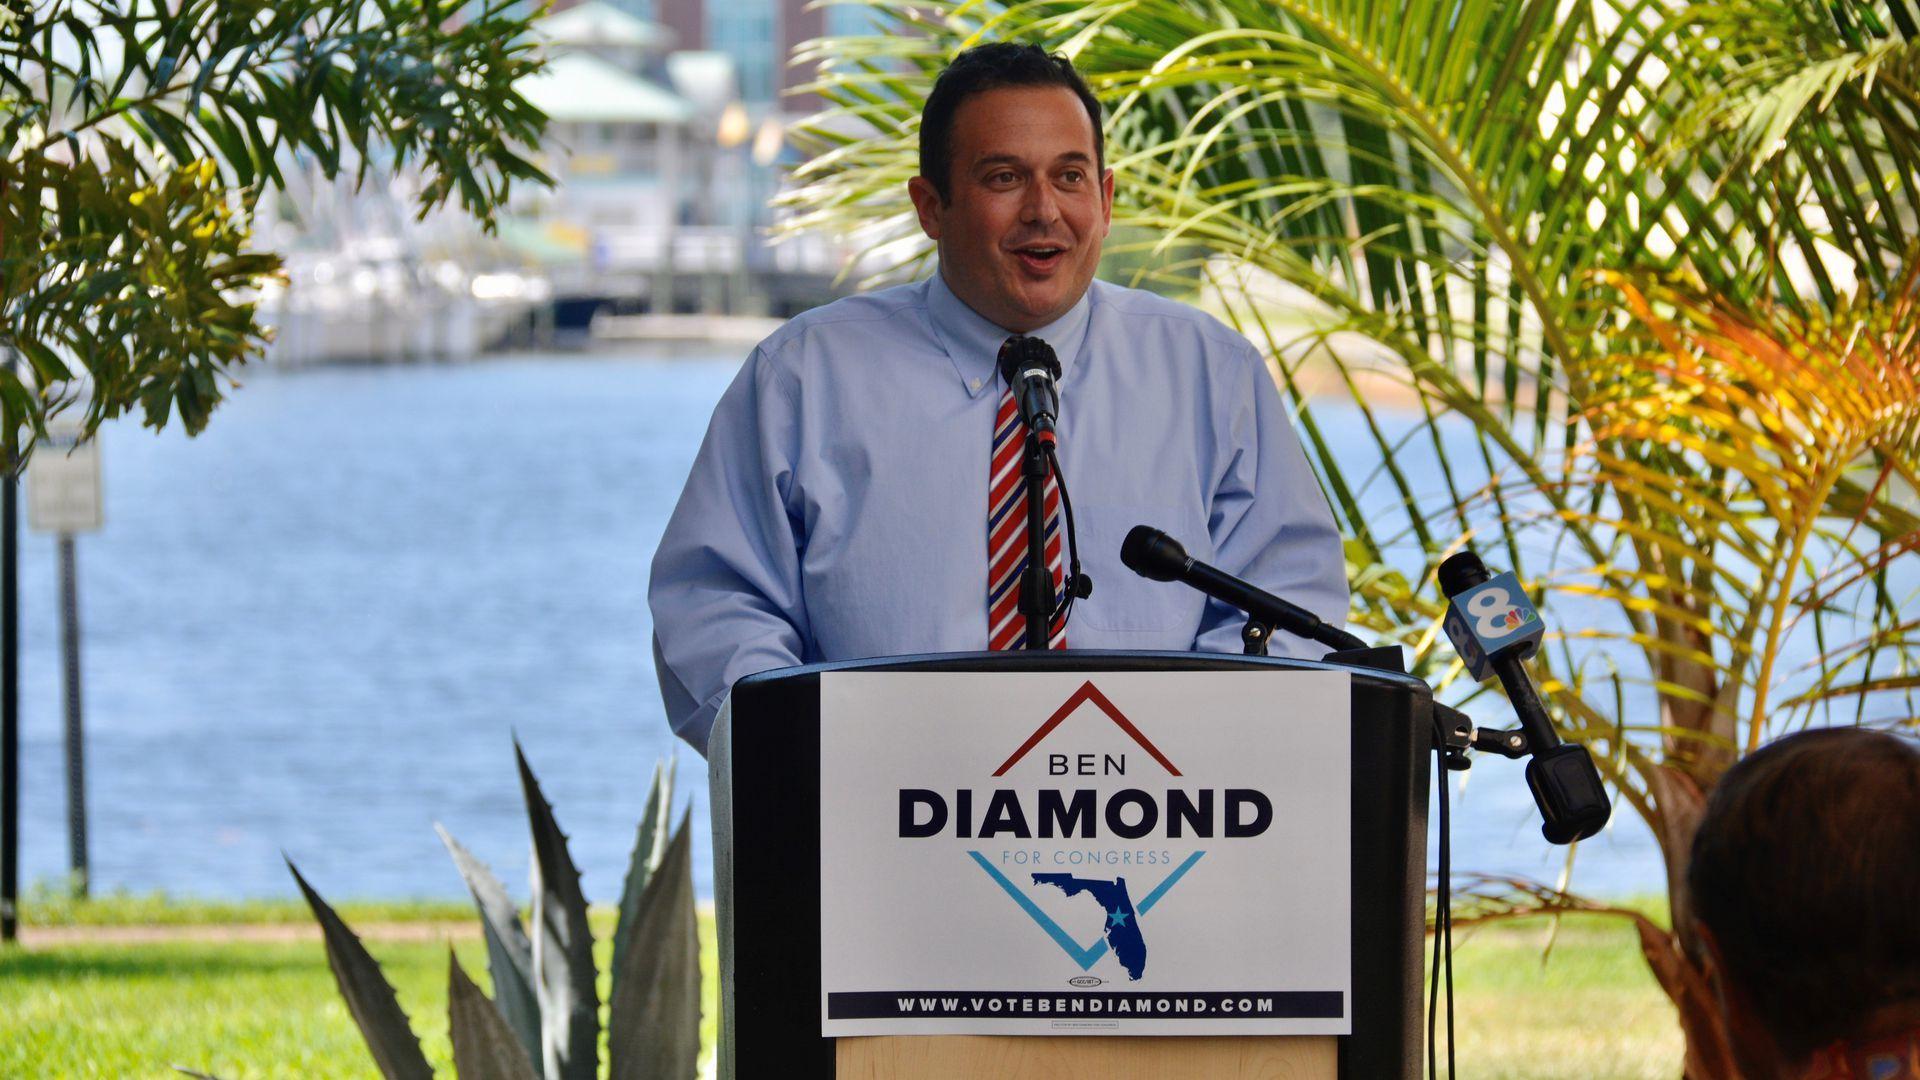 Ben Diamond stands at a podium